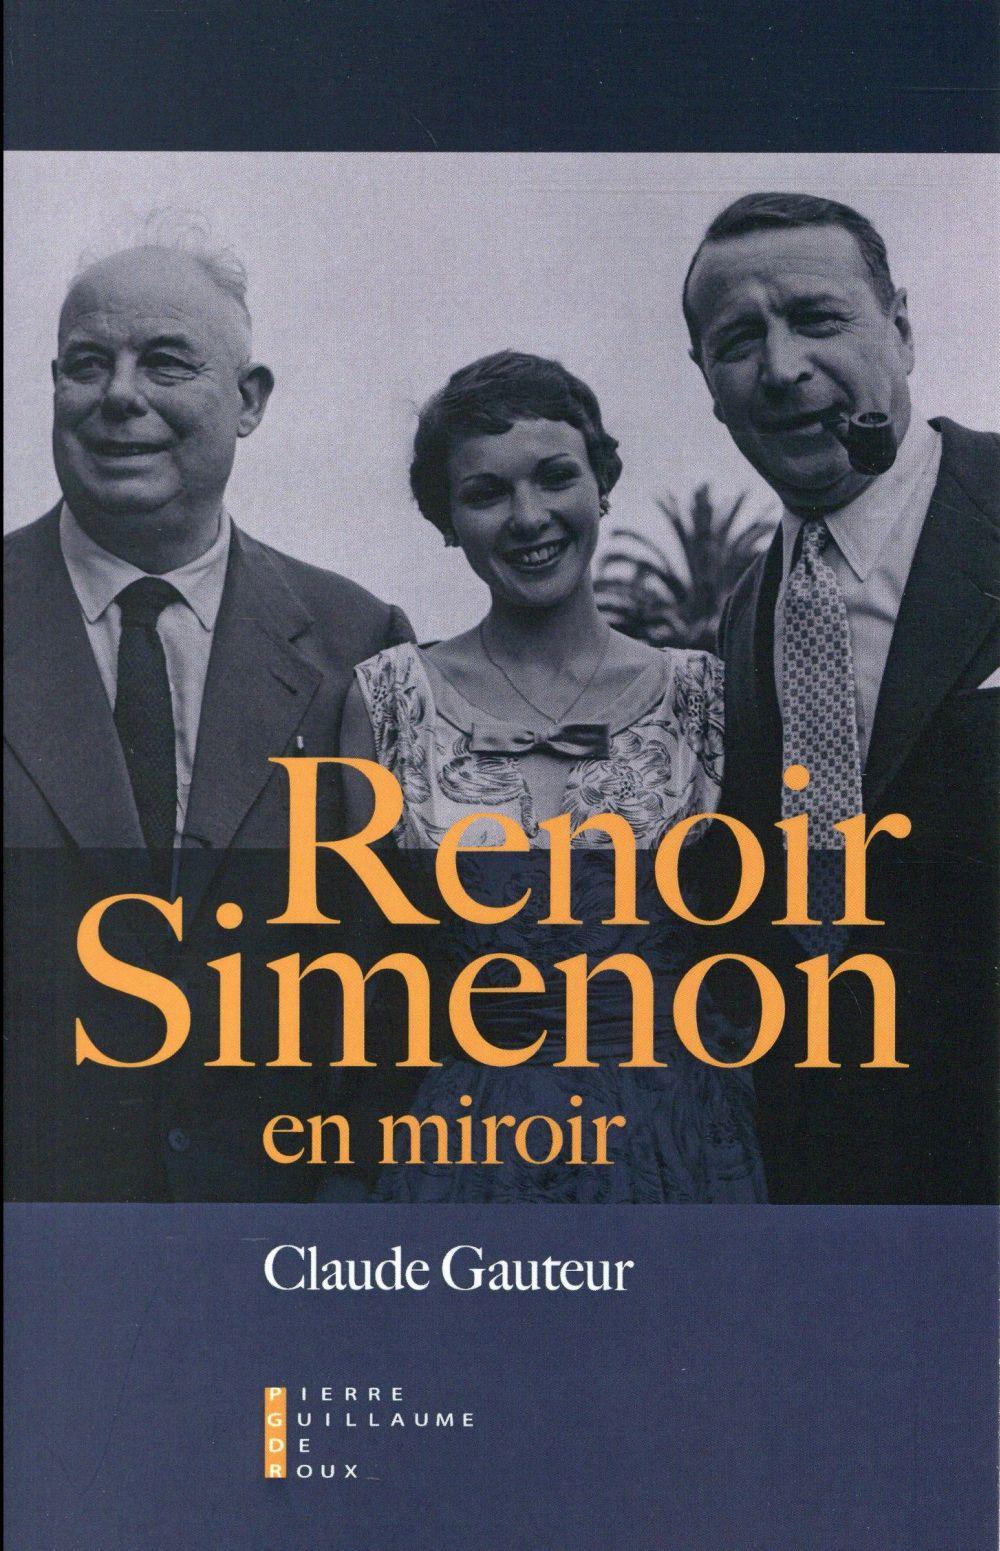 Renoir-Simenon en miroir